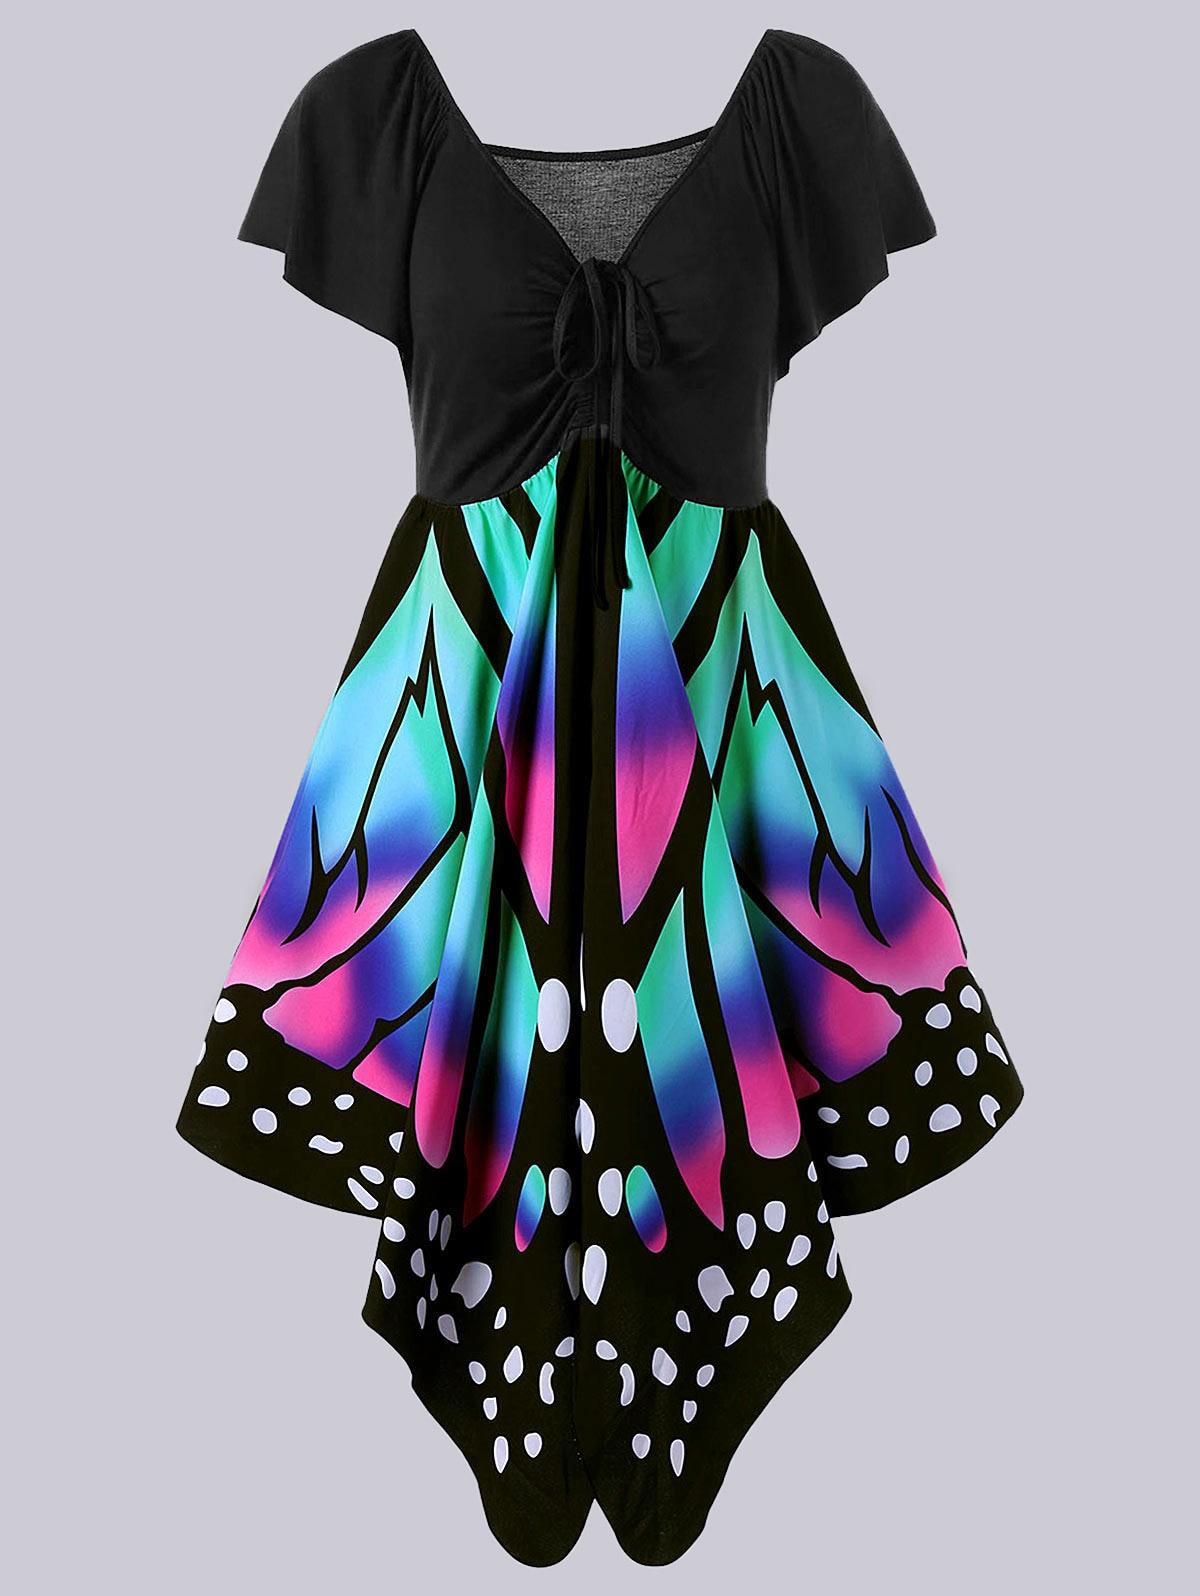 Gamiss Hot Schmetterling Form Frauen Mode Kleid Plus Größe 5XL V ...